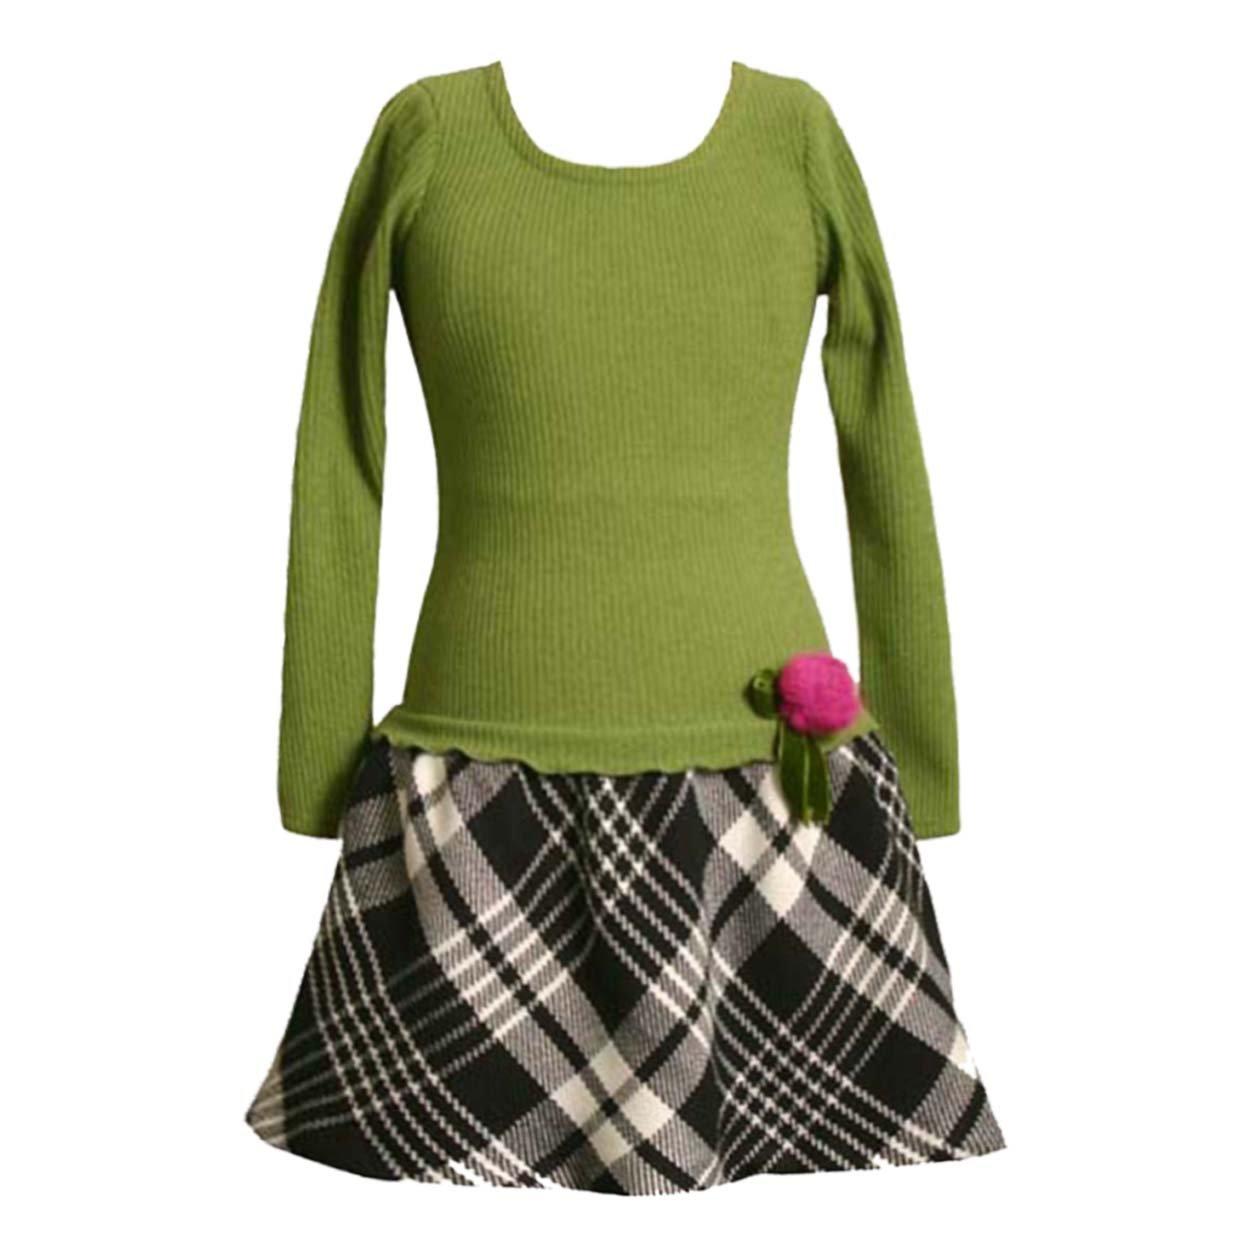 Cute Sweater Dresses for Girls, Seekyt